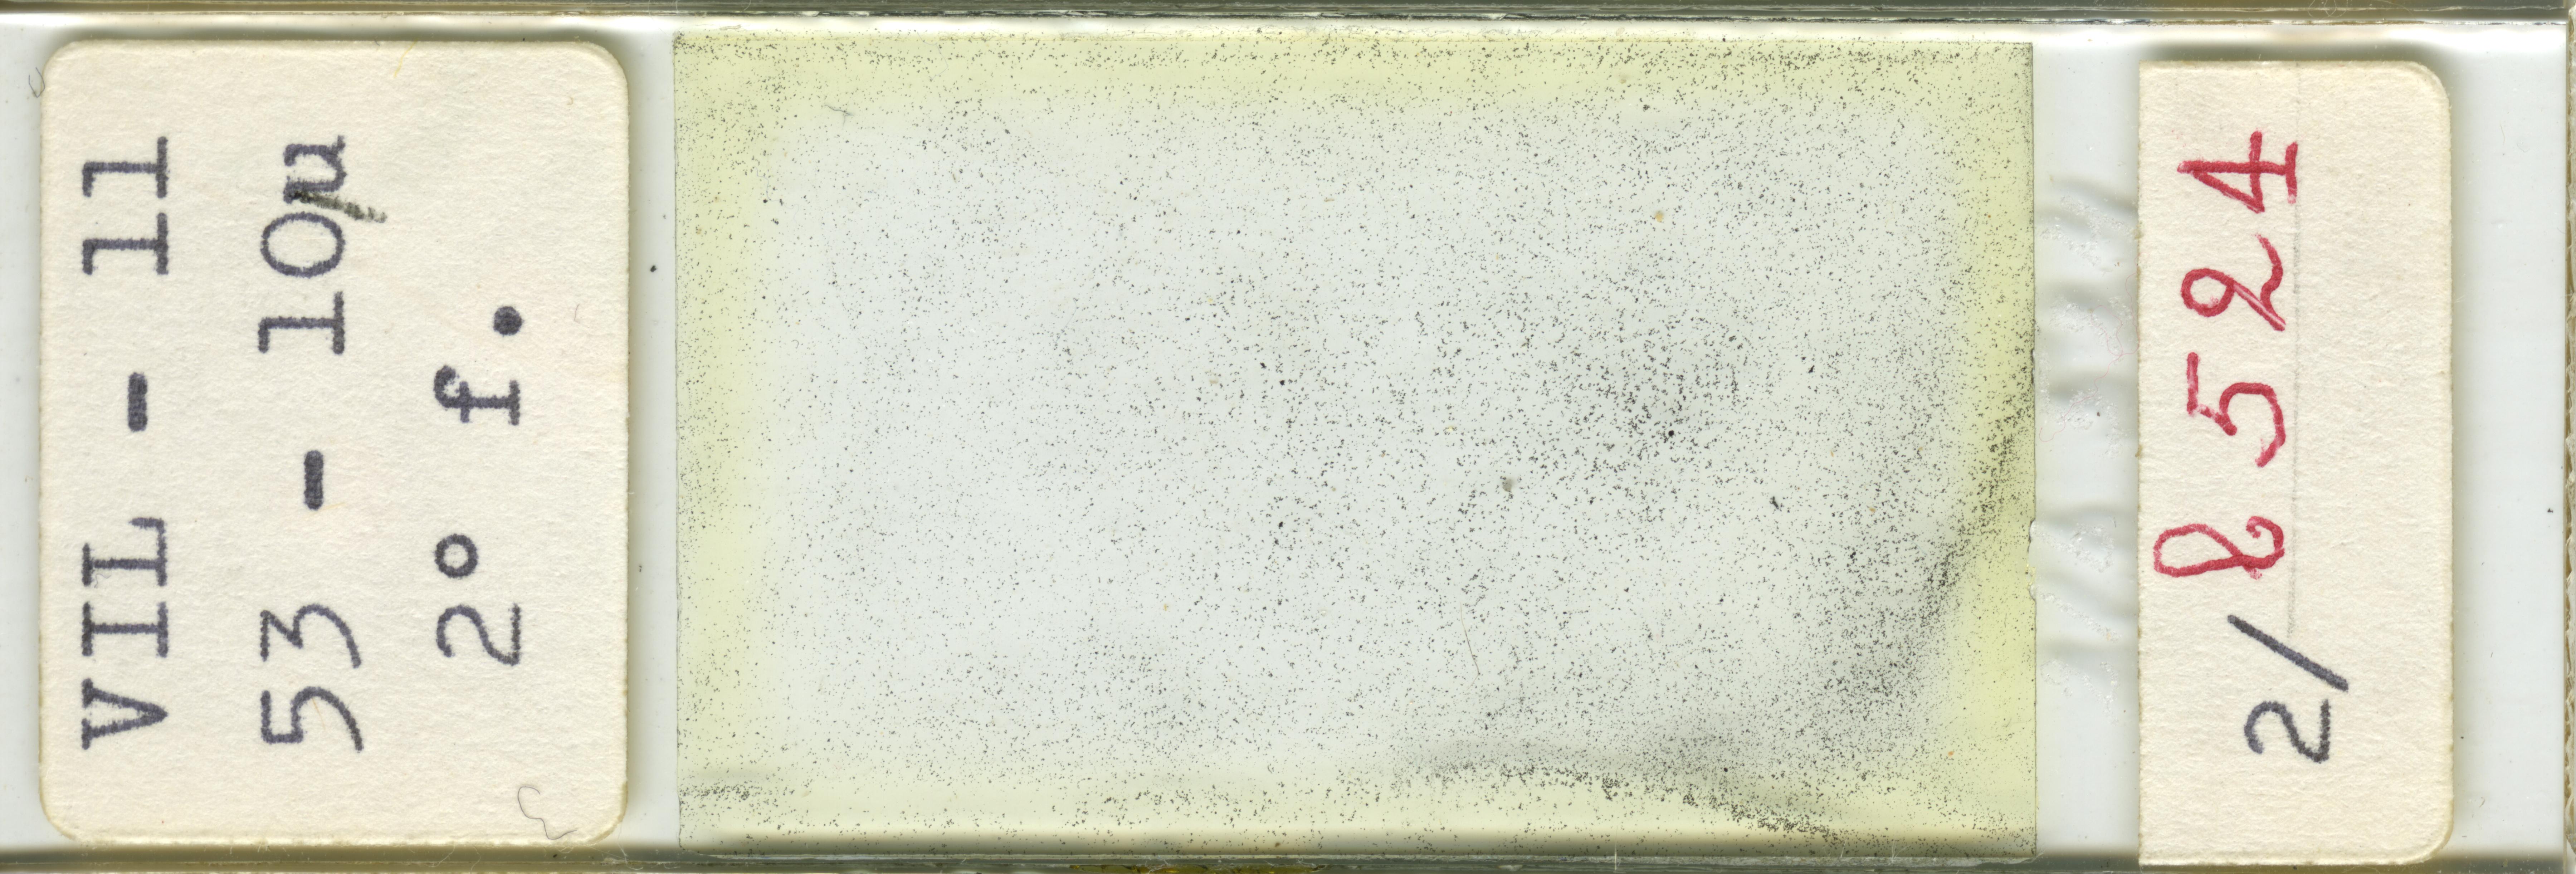 Lame n°VIL - 11 53 - 10µ 2° f. 2/b 524